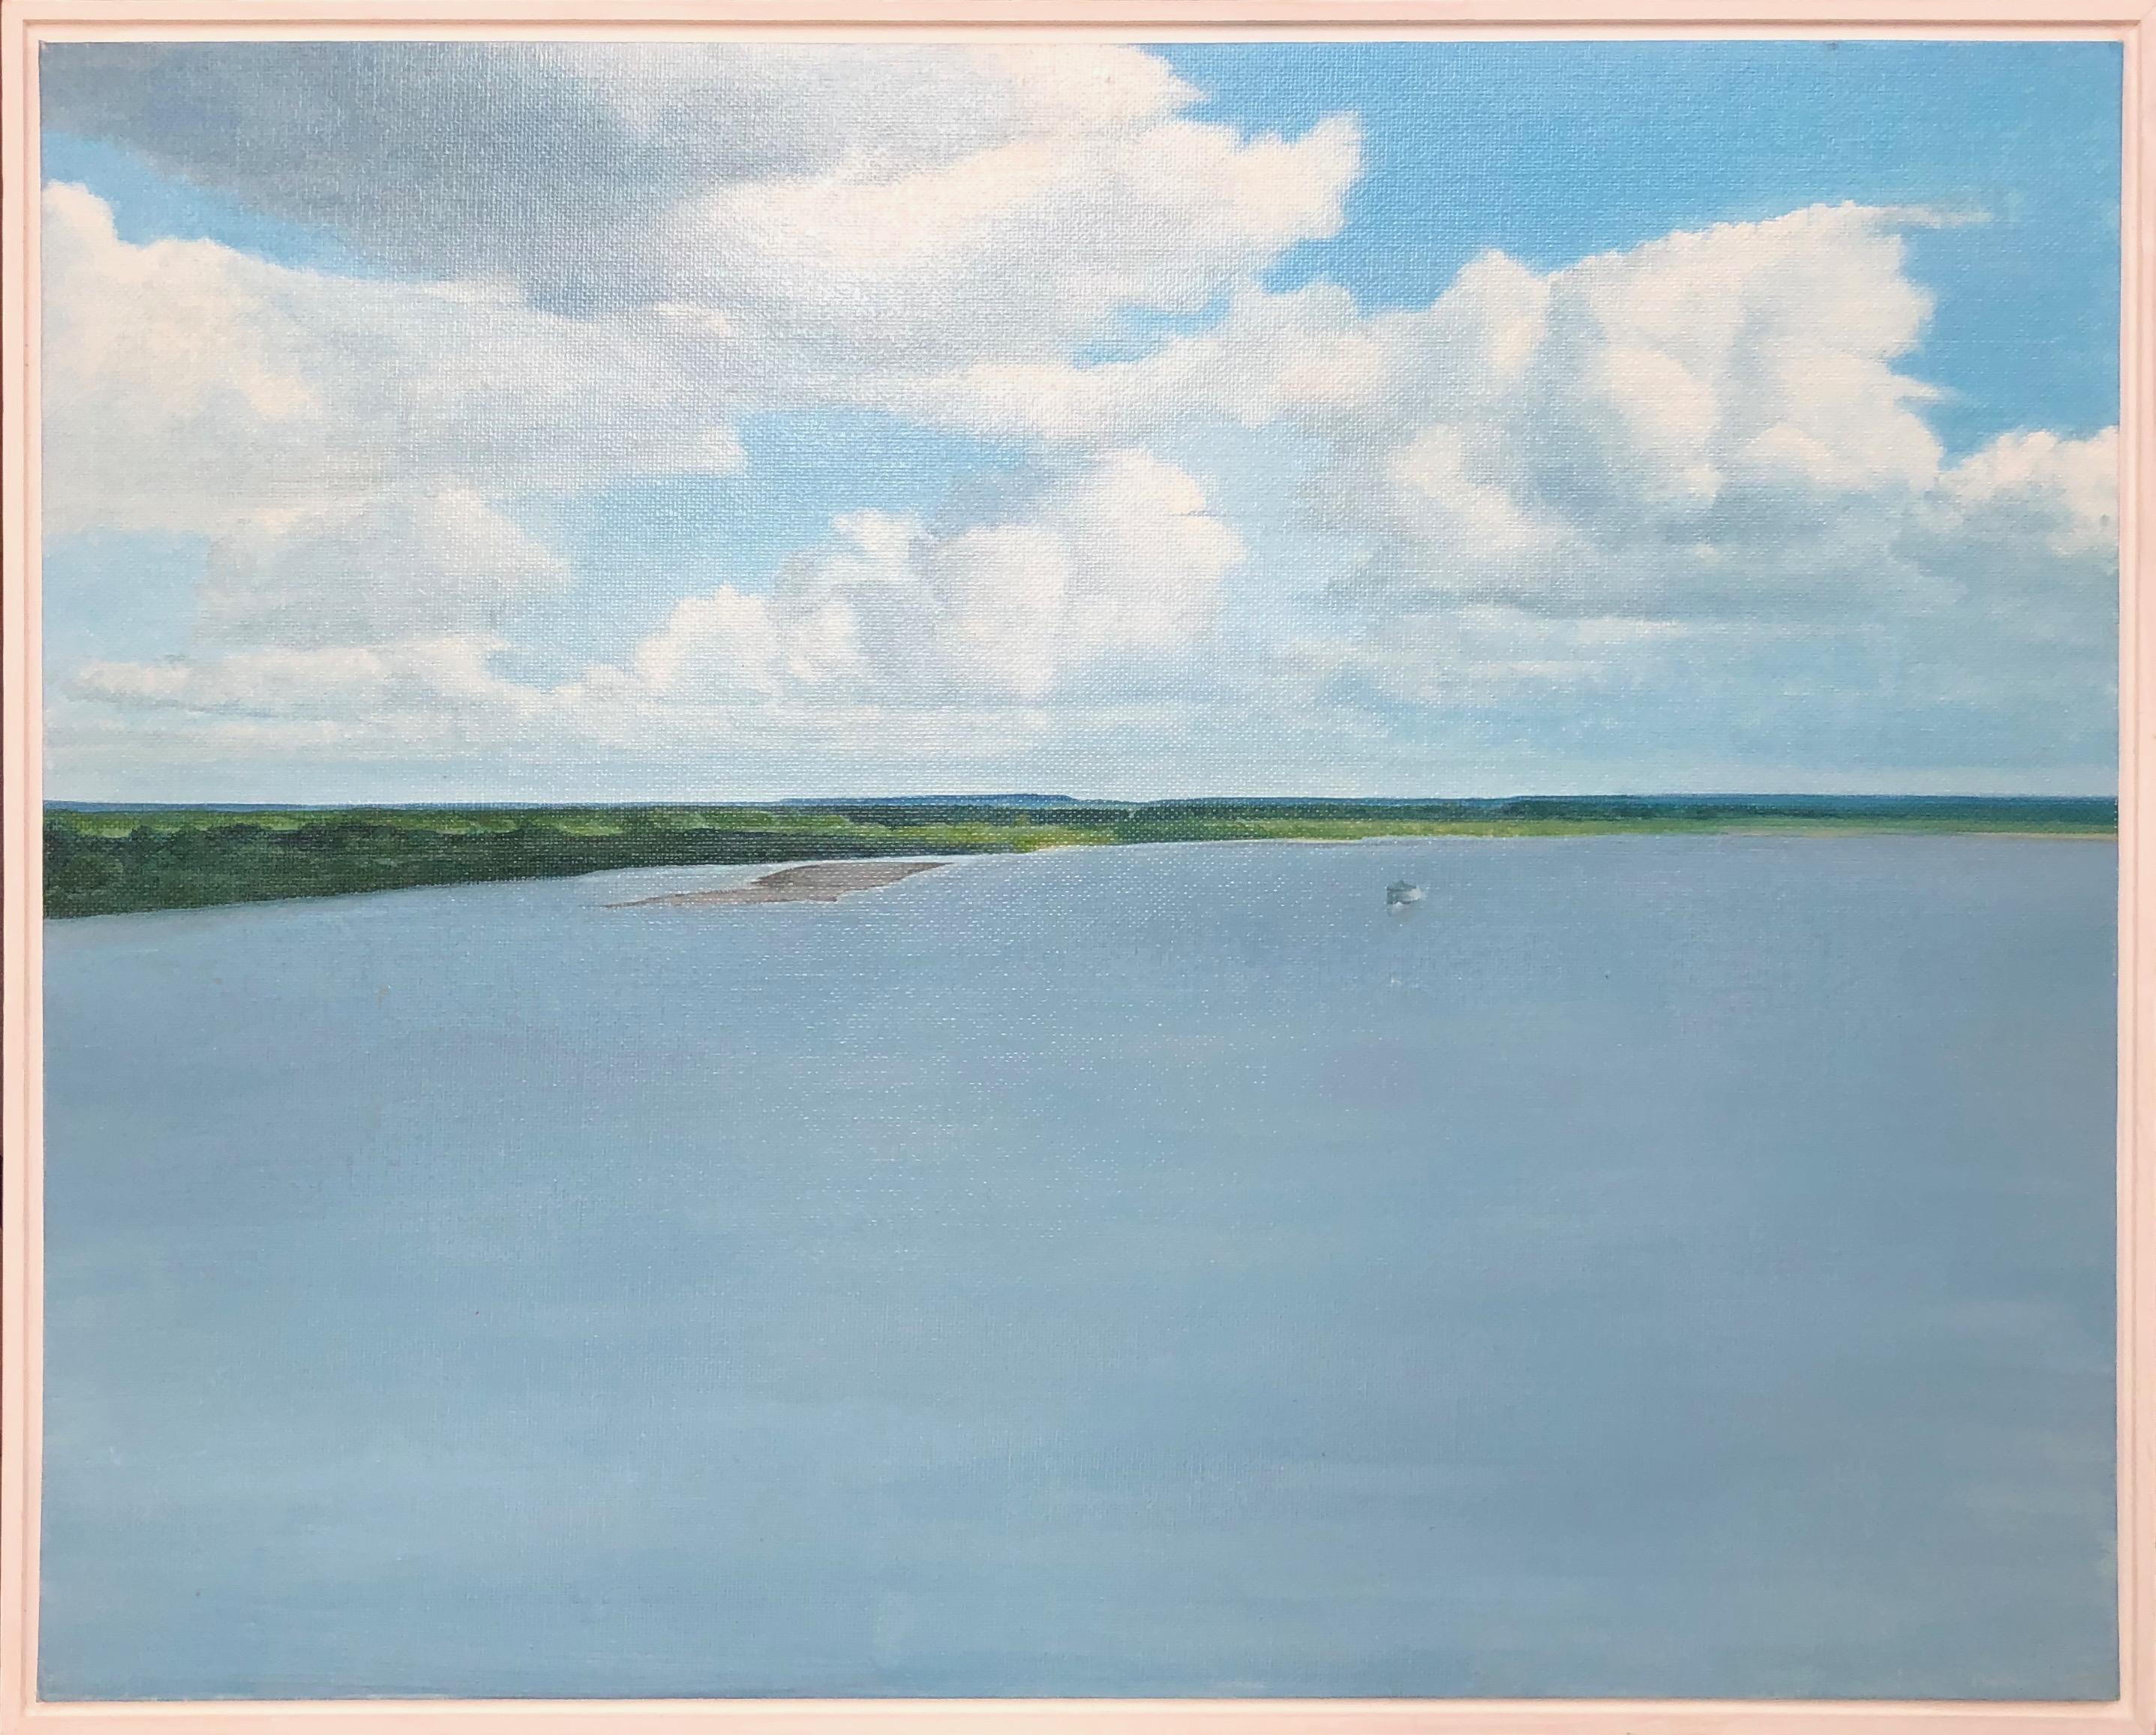 Late departure-landscape, canvas on cardboard, oil, framed, made in green, blue